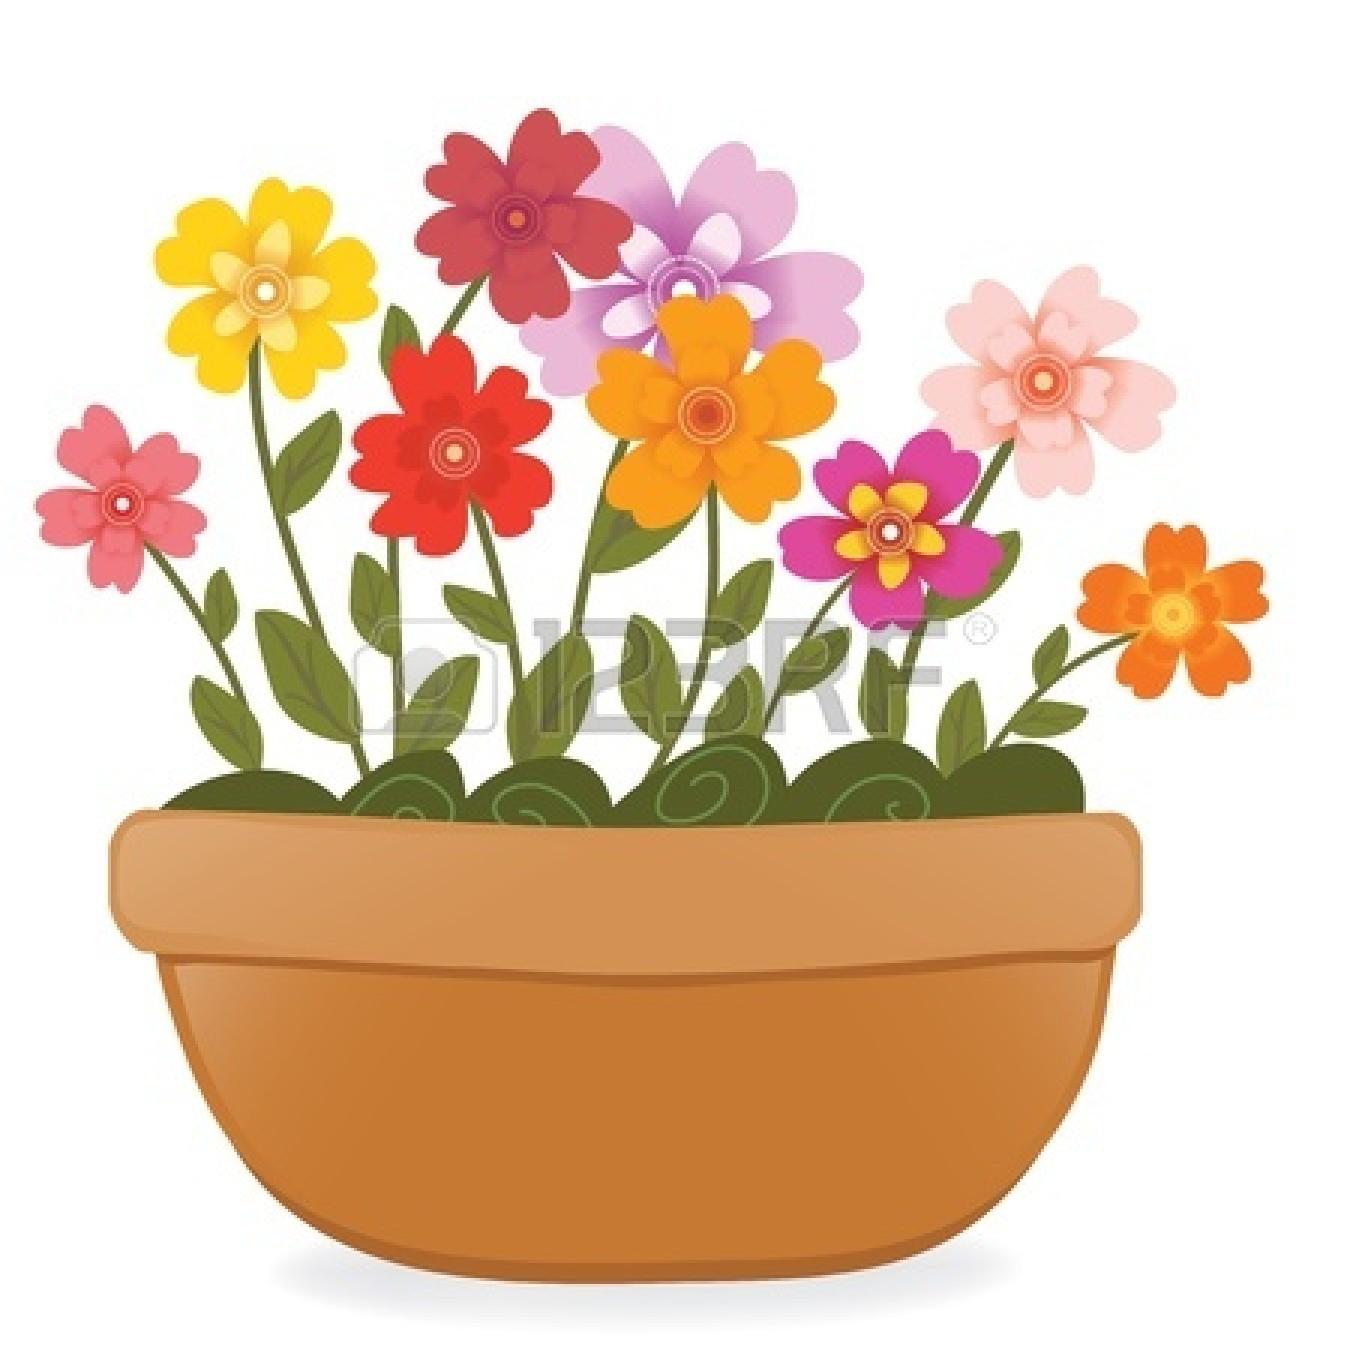 Clip Art Flower Pot Clipart spring flower pot clipart kid potted 18688688 jpg